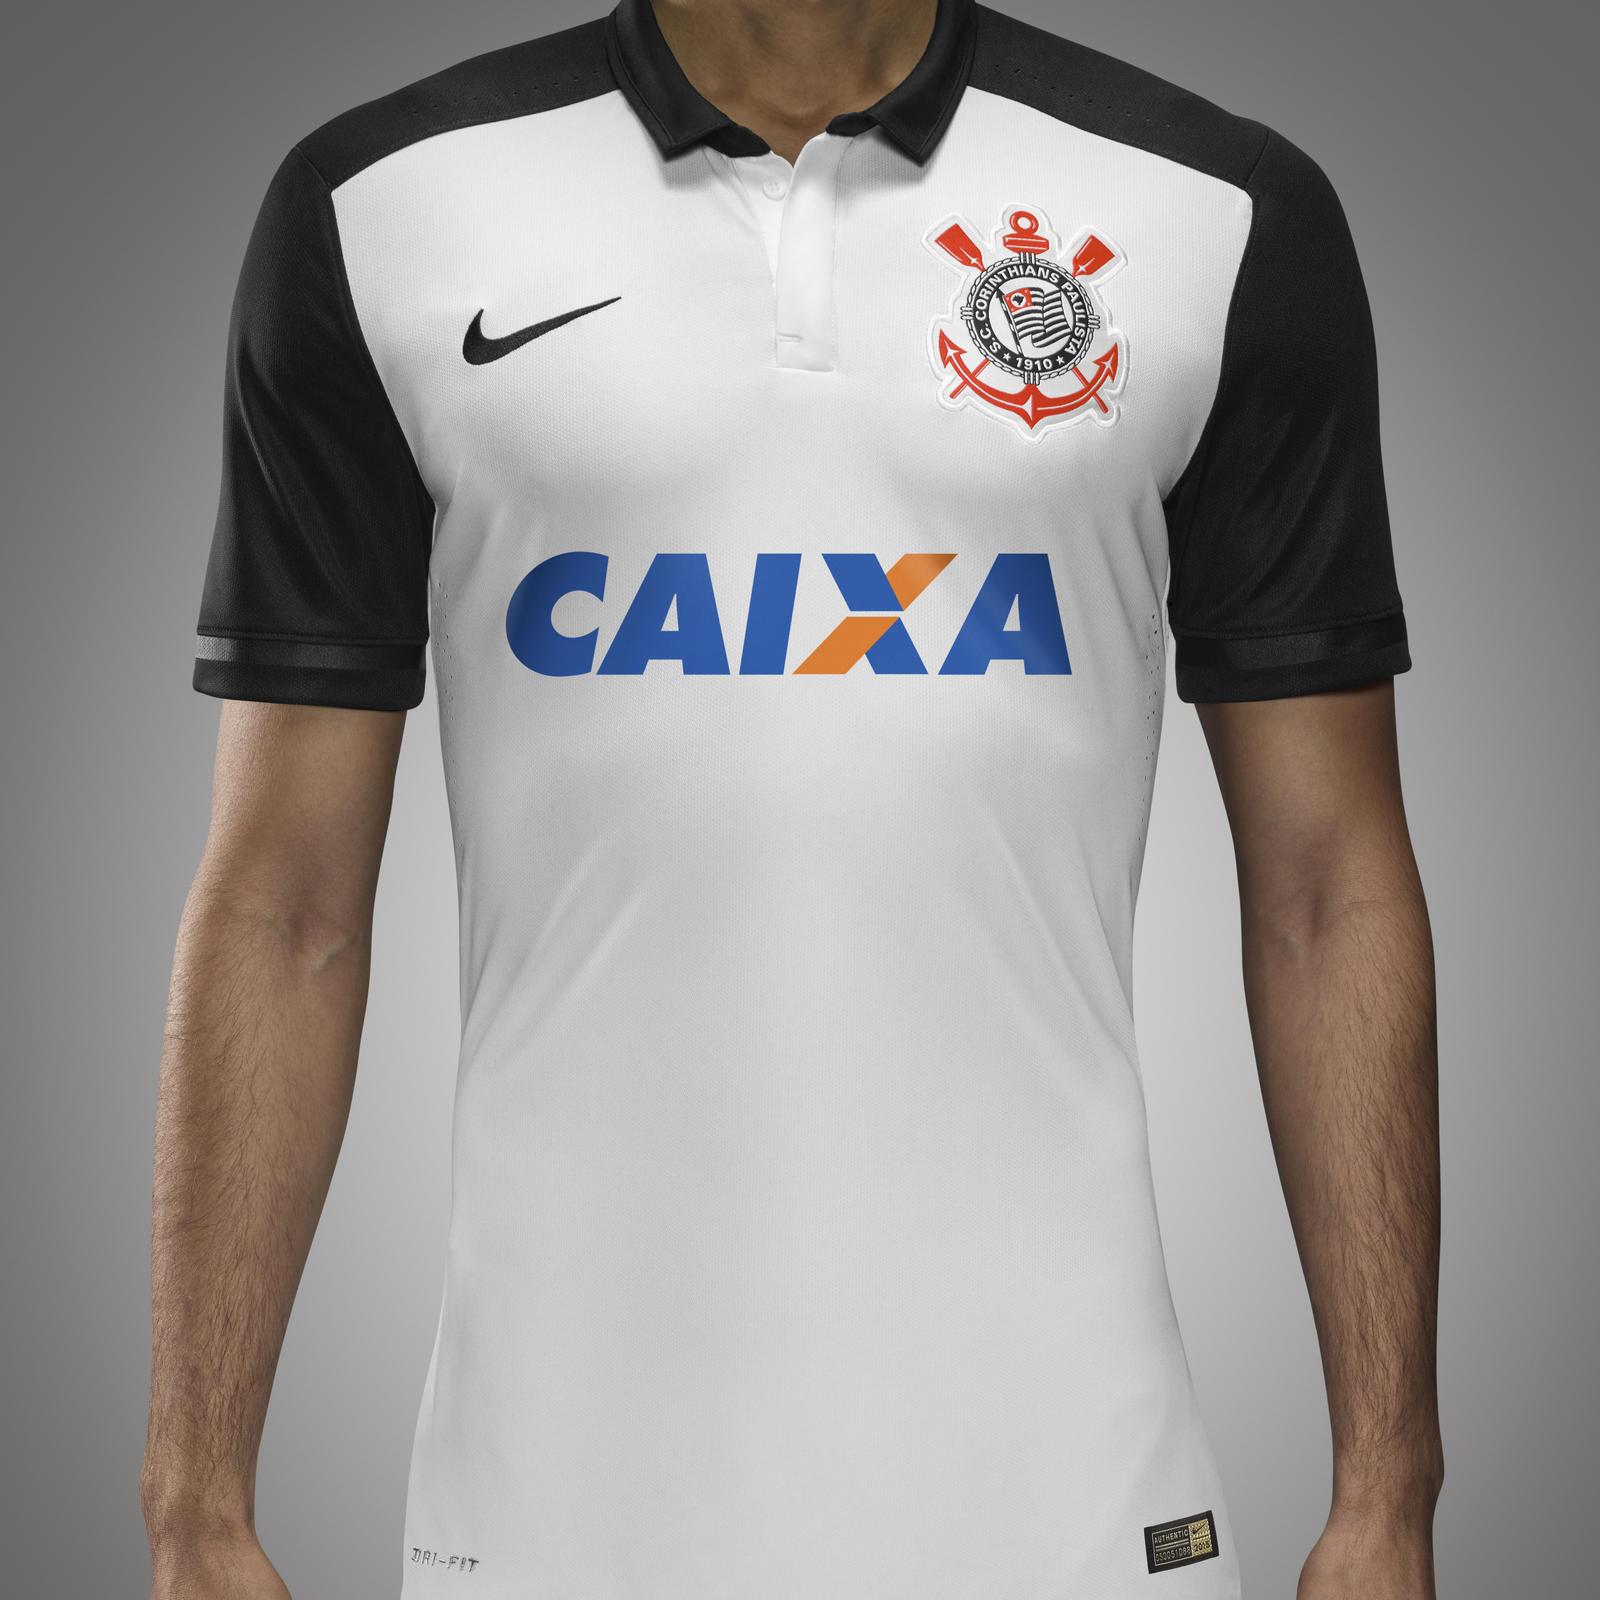 480985fe82 Nova camisa 3 – laranja – do alvinegro. – Fut Pop Clube